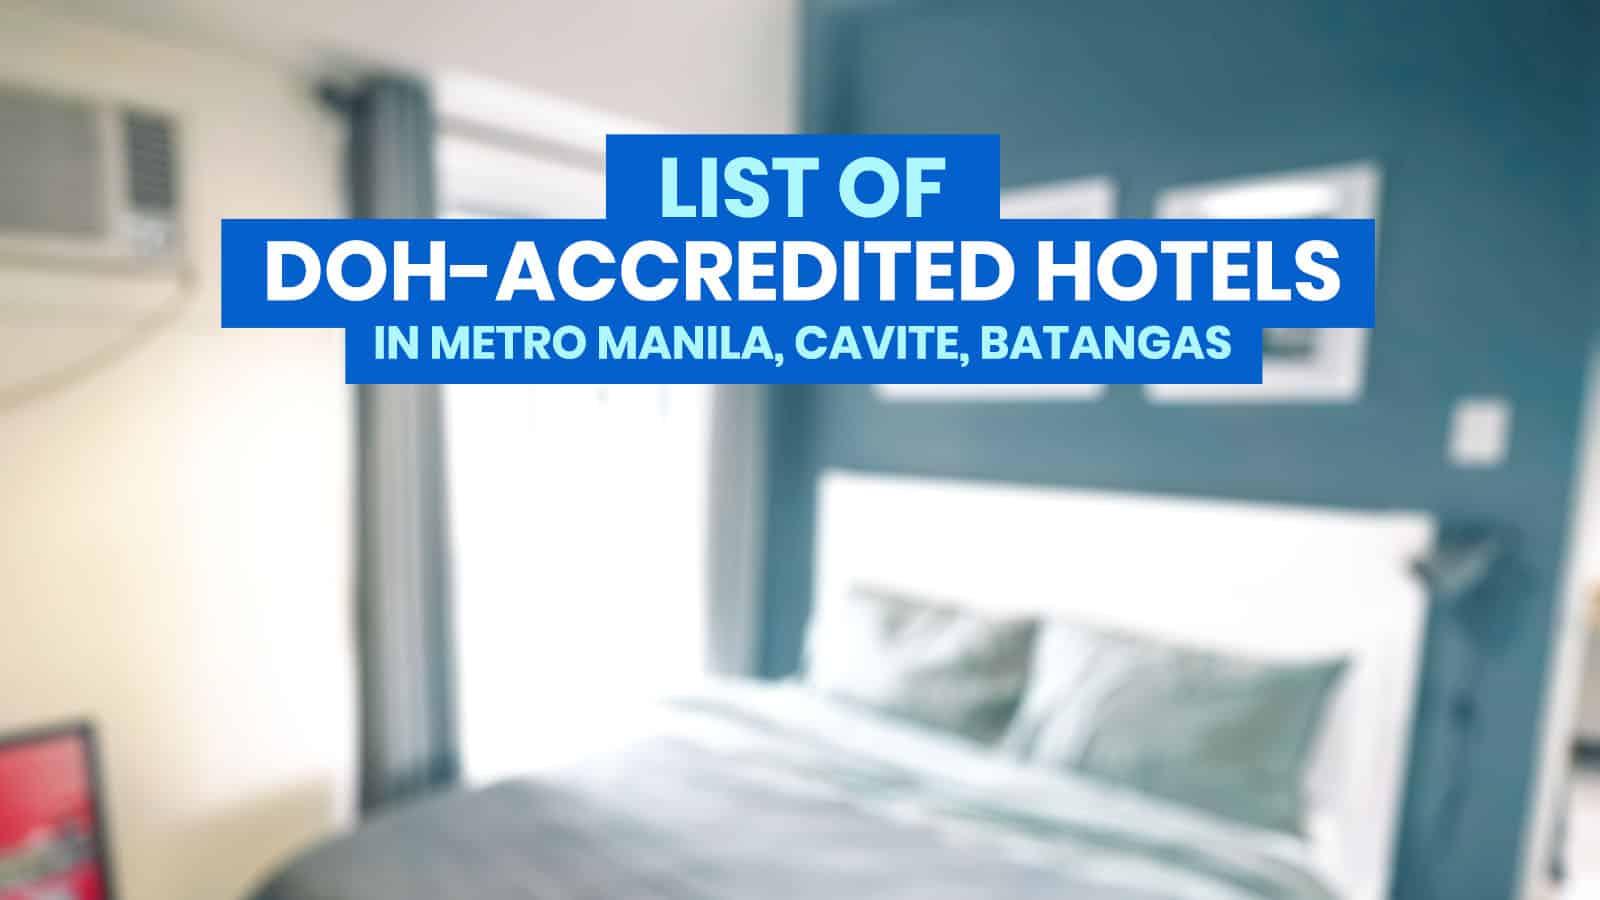 List of DOH-Accredited Hotels for Quarantine in Metro Manila, Cavite & Batangas